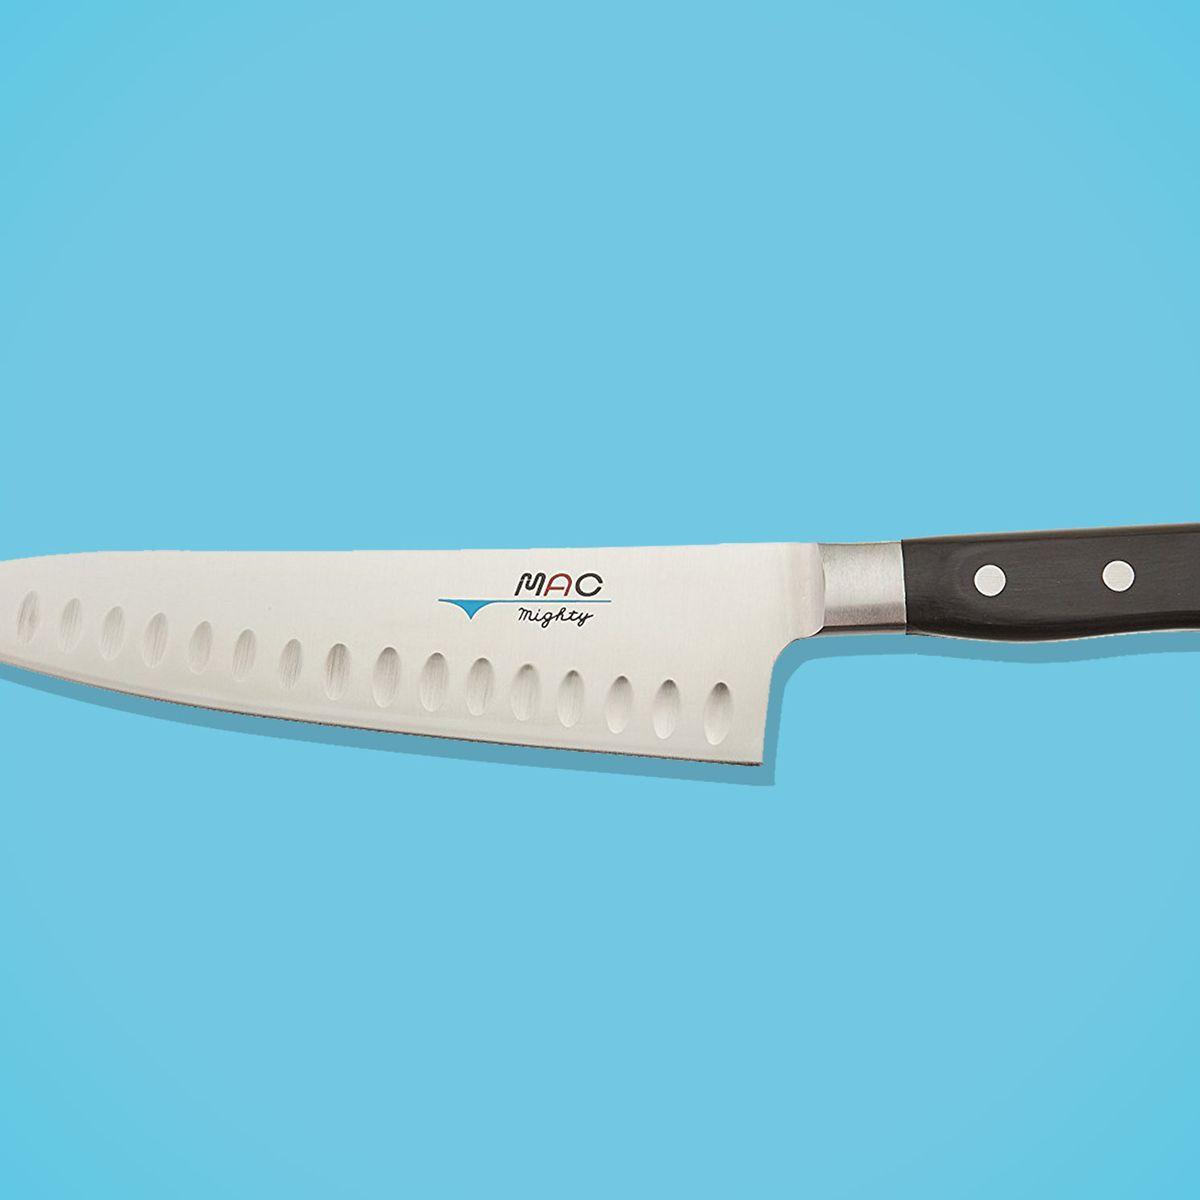 Best Japanese Knife Mac Knife Review 2018 The Strategist New York Magazine